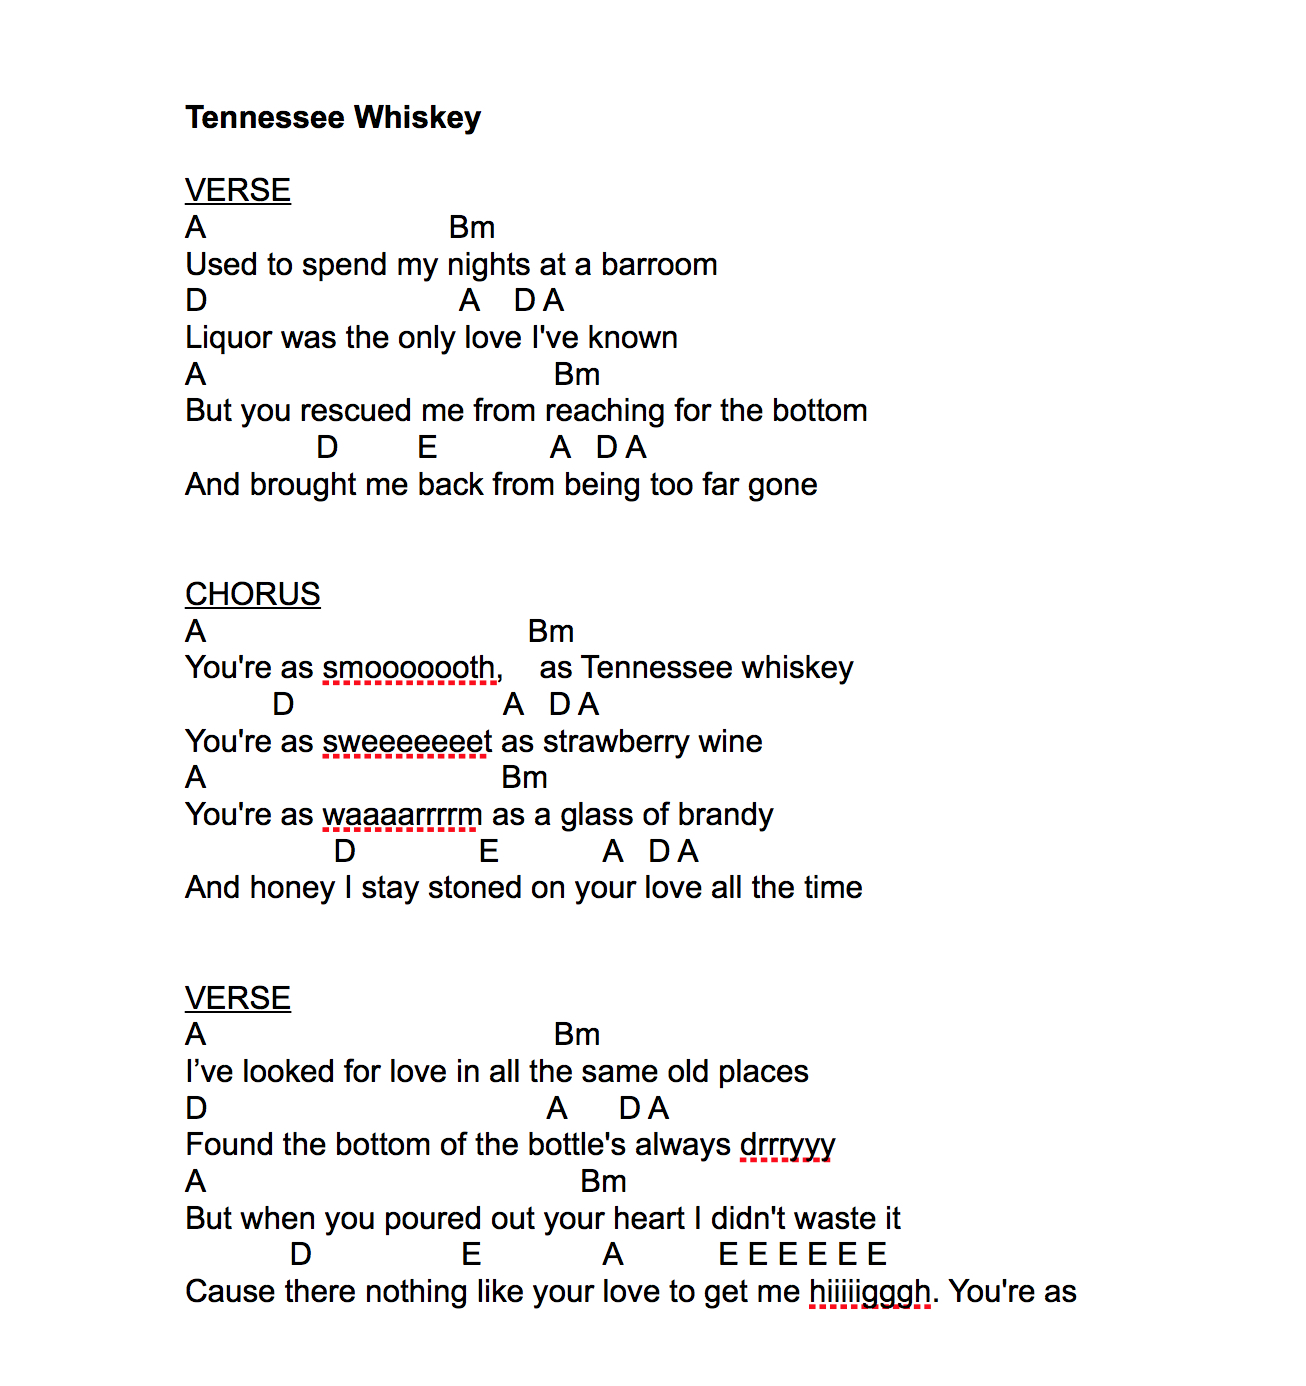 Tennessee Whiskey.jpg